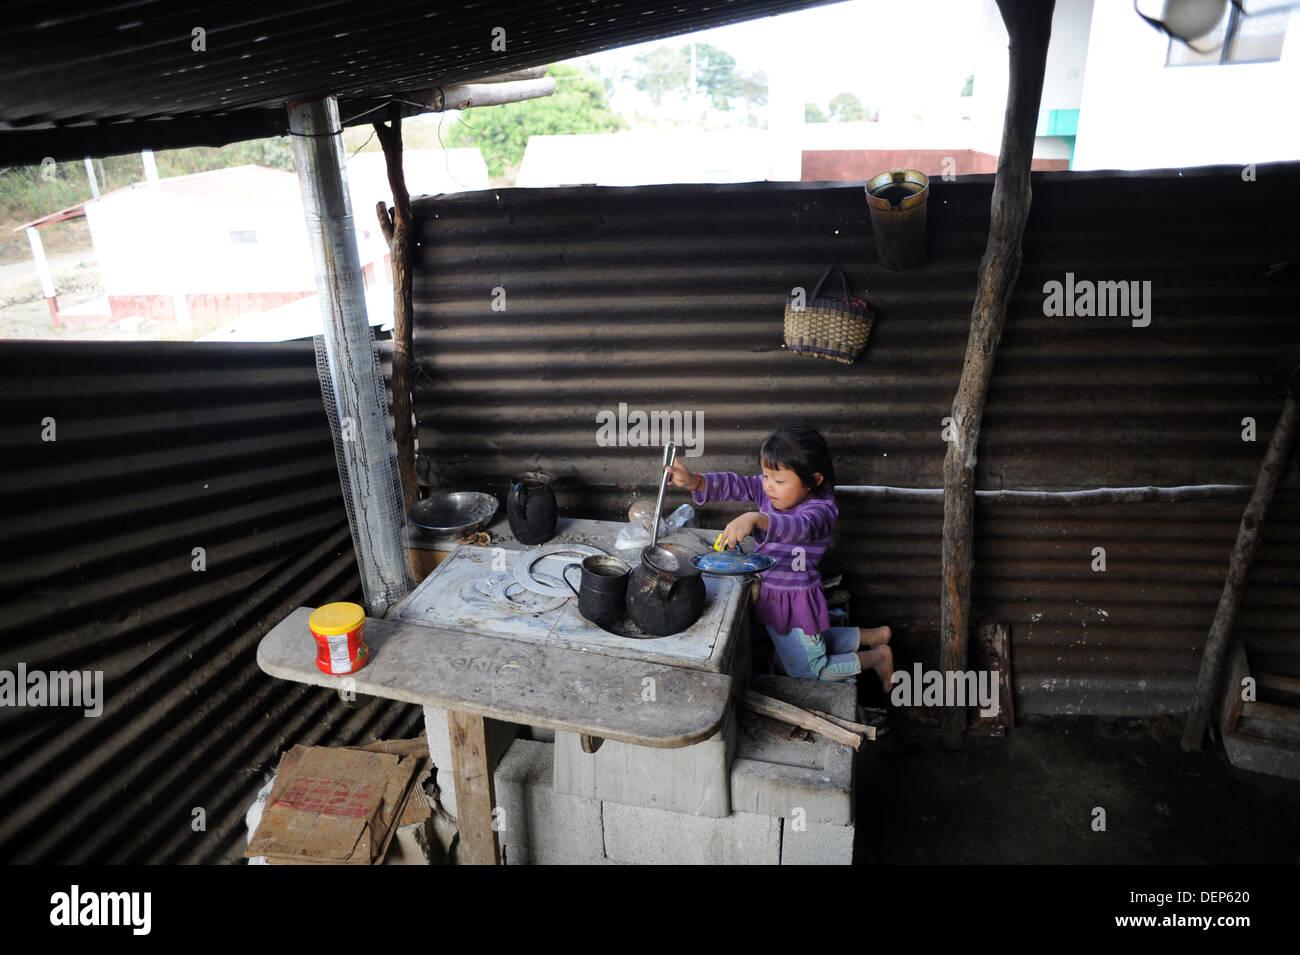 A mayan guatemala indigenous girl cooks in the kitchen in Chuk Muk, Santiago Atitaln, Guatemala. - Stock Image